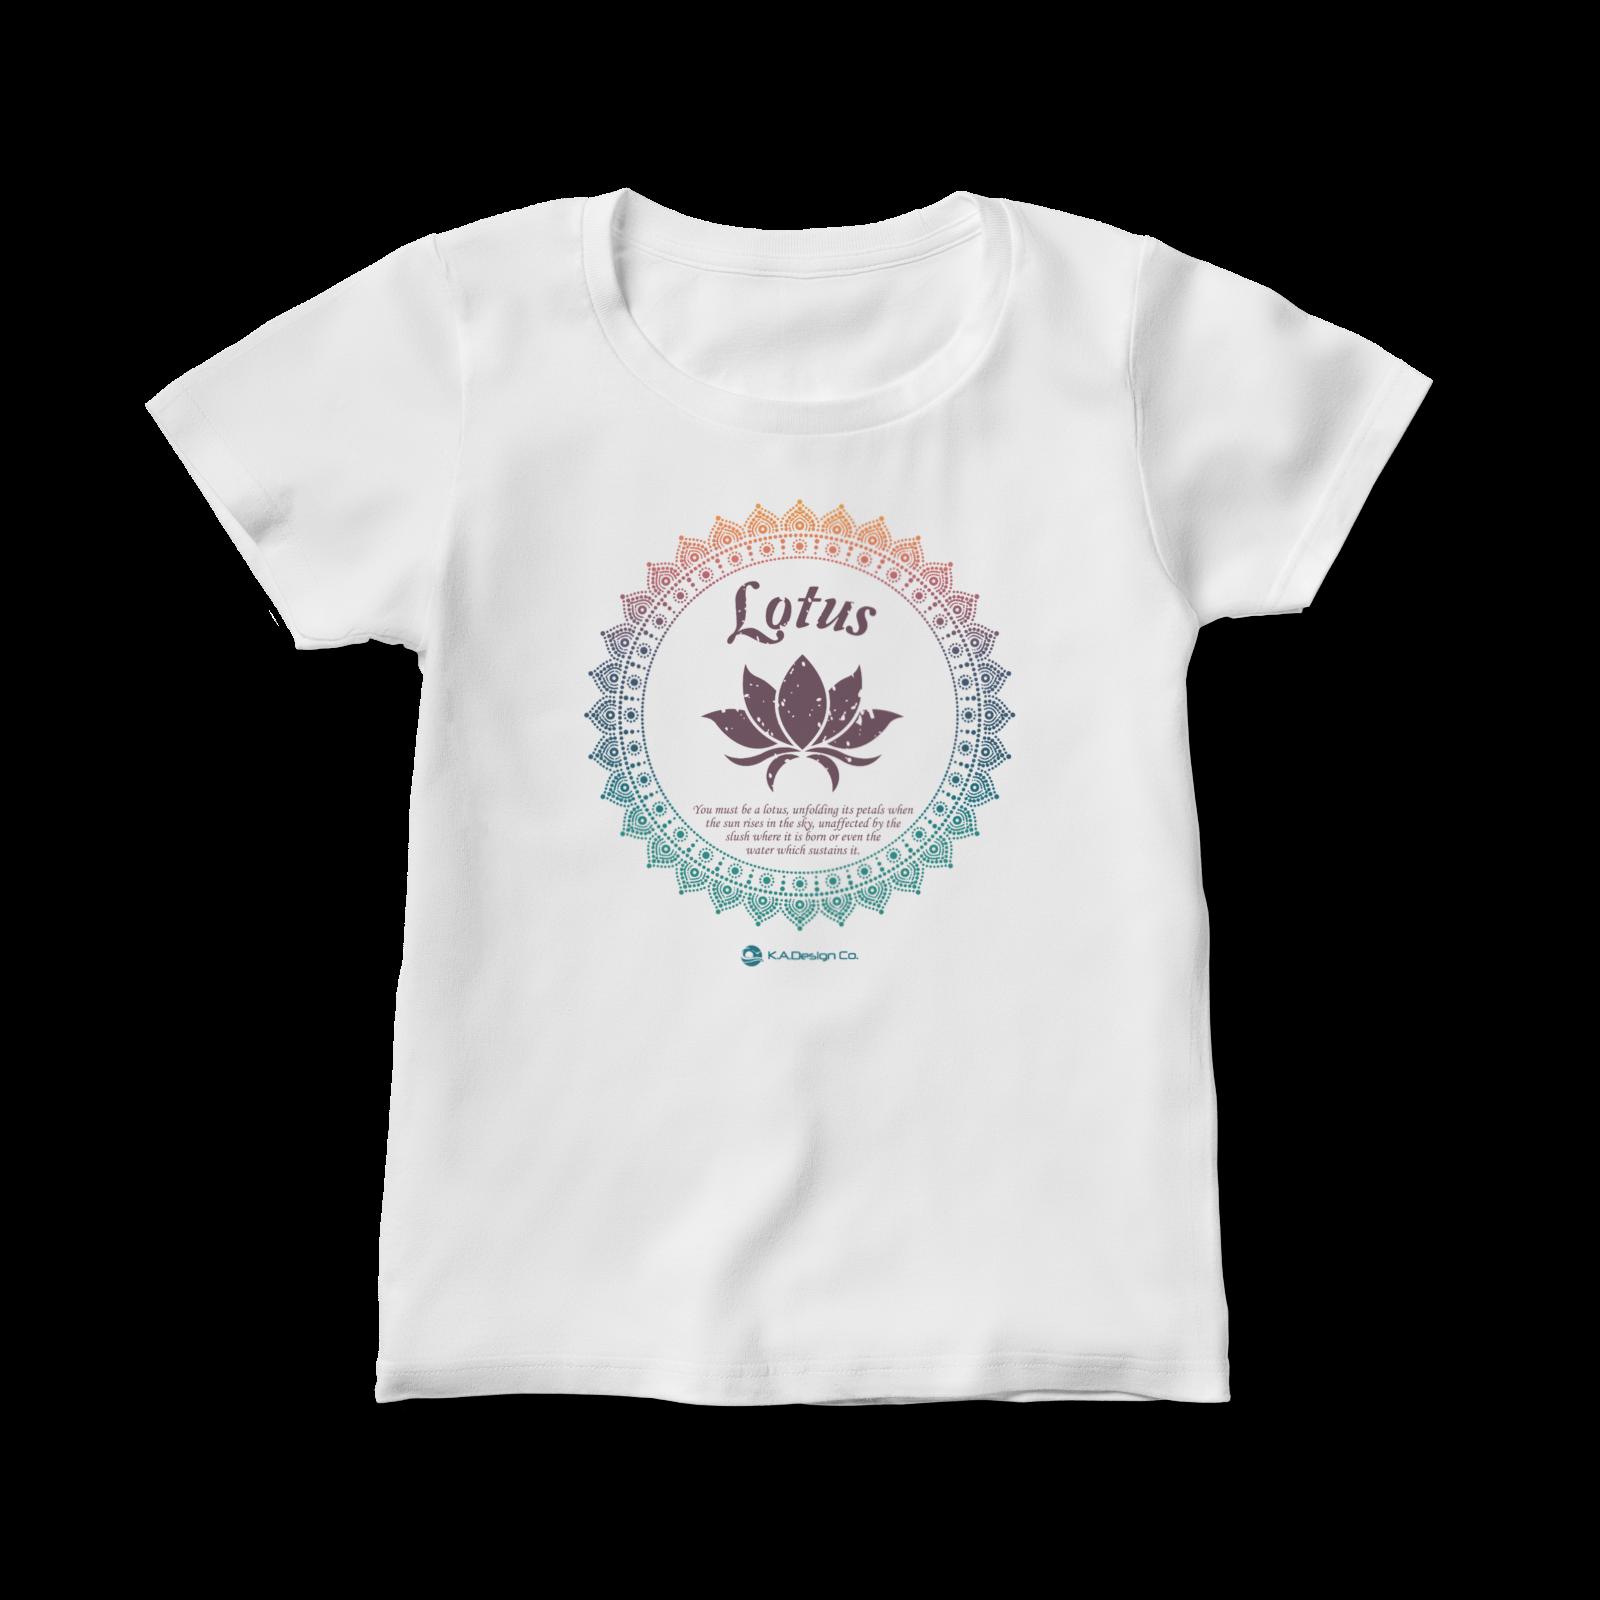 【個別対応】Lady's Lotus Tee